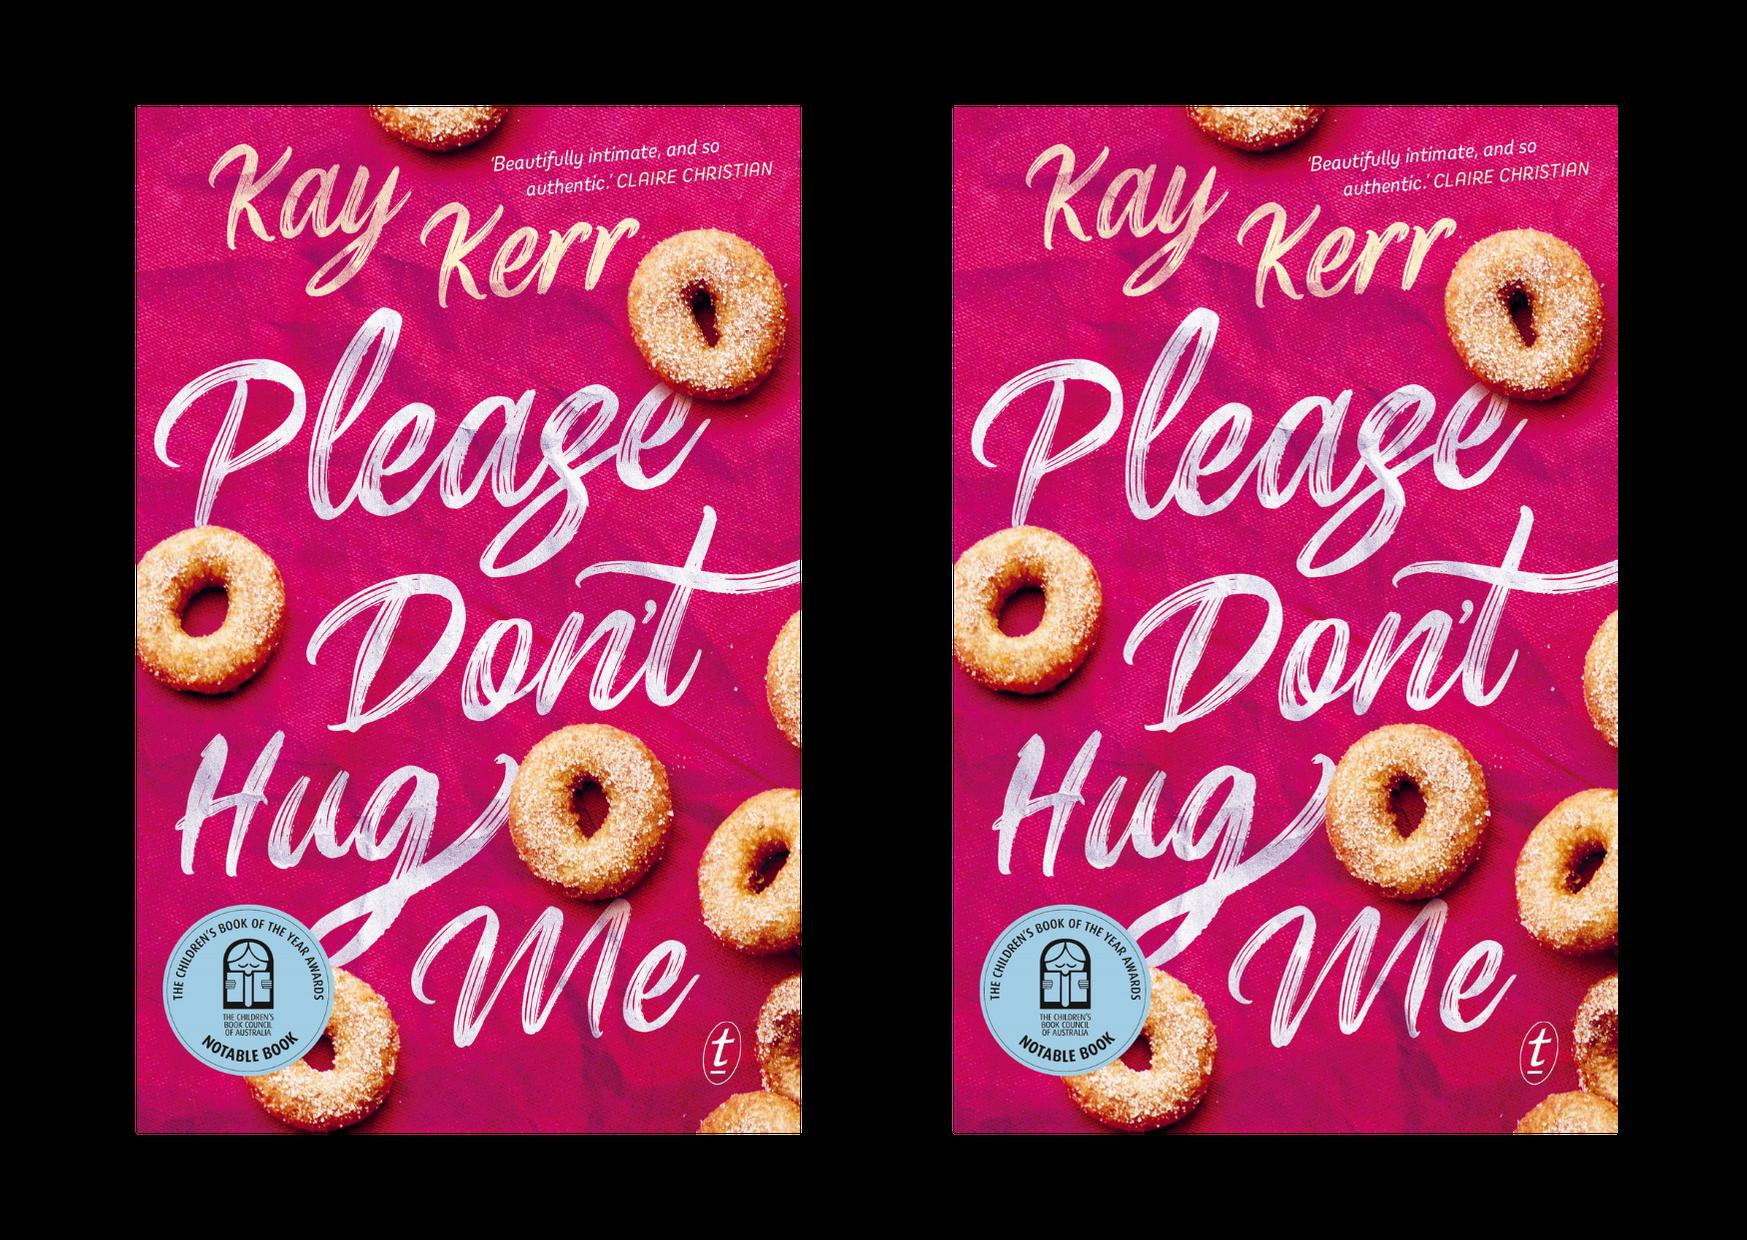 Text - Please Don't Hug Me